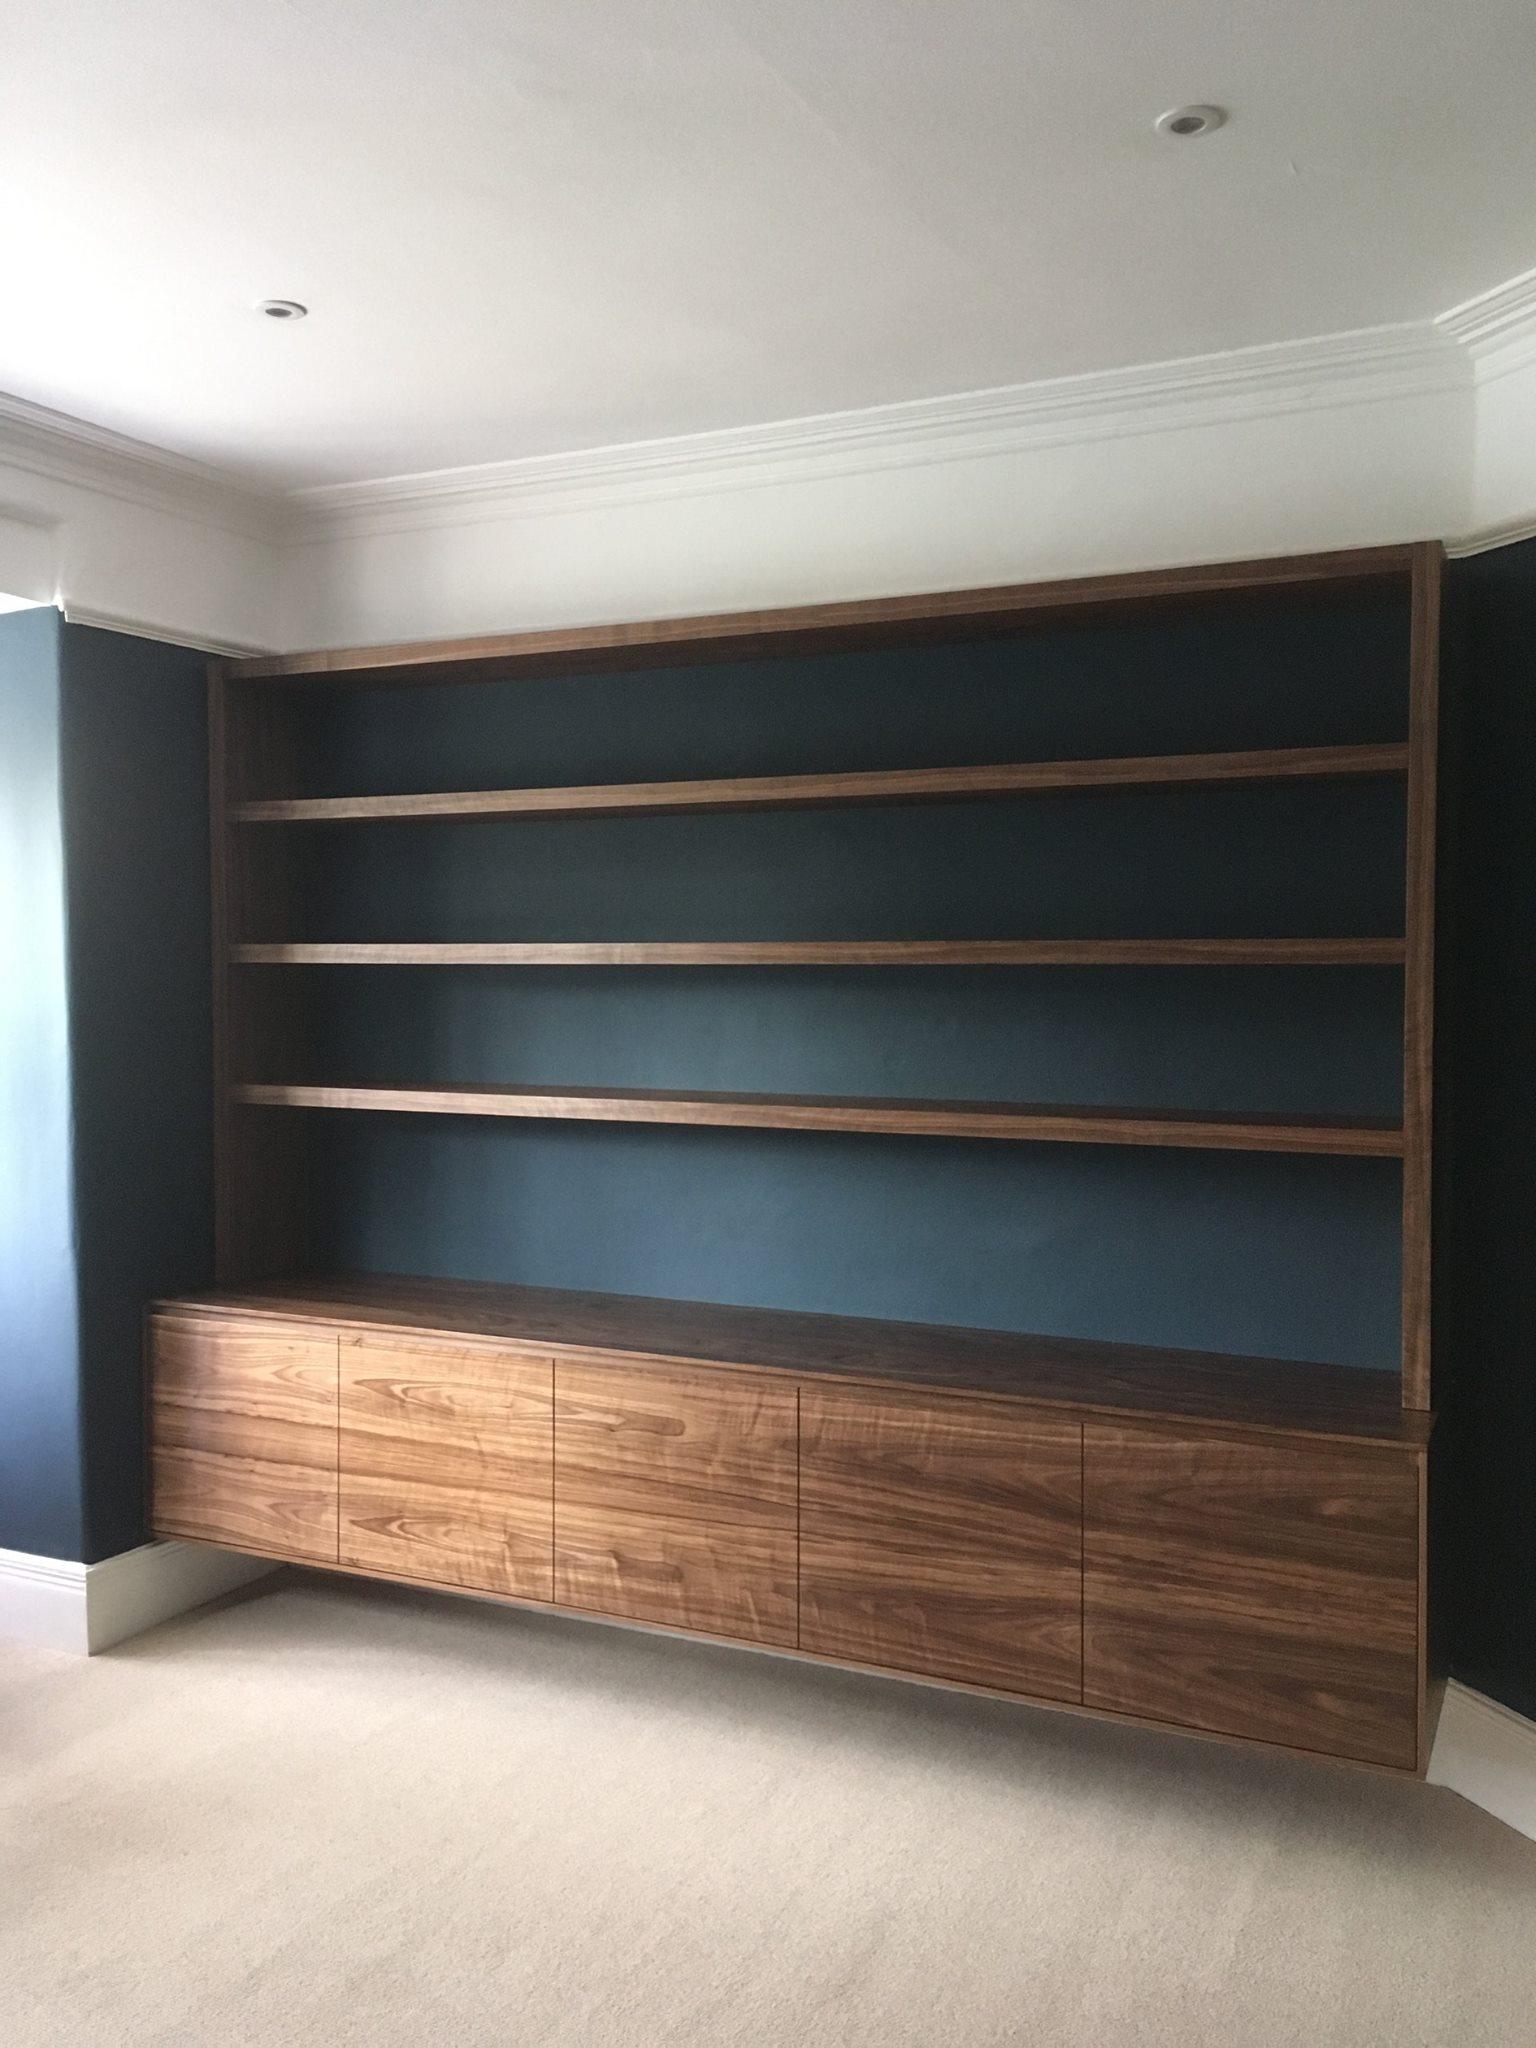 Residential: home office renovation bespoke built walnut veneered shelving & cupboards.